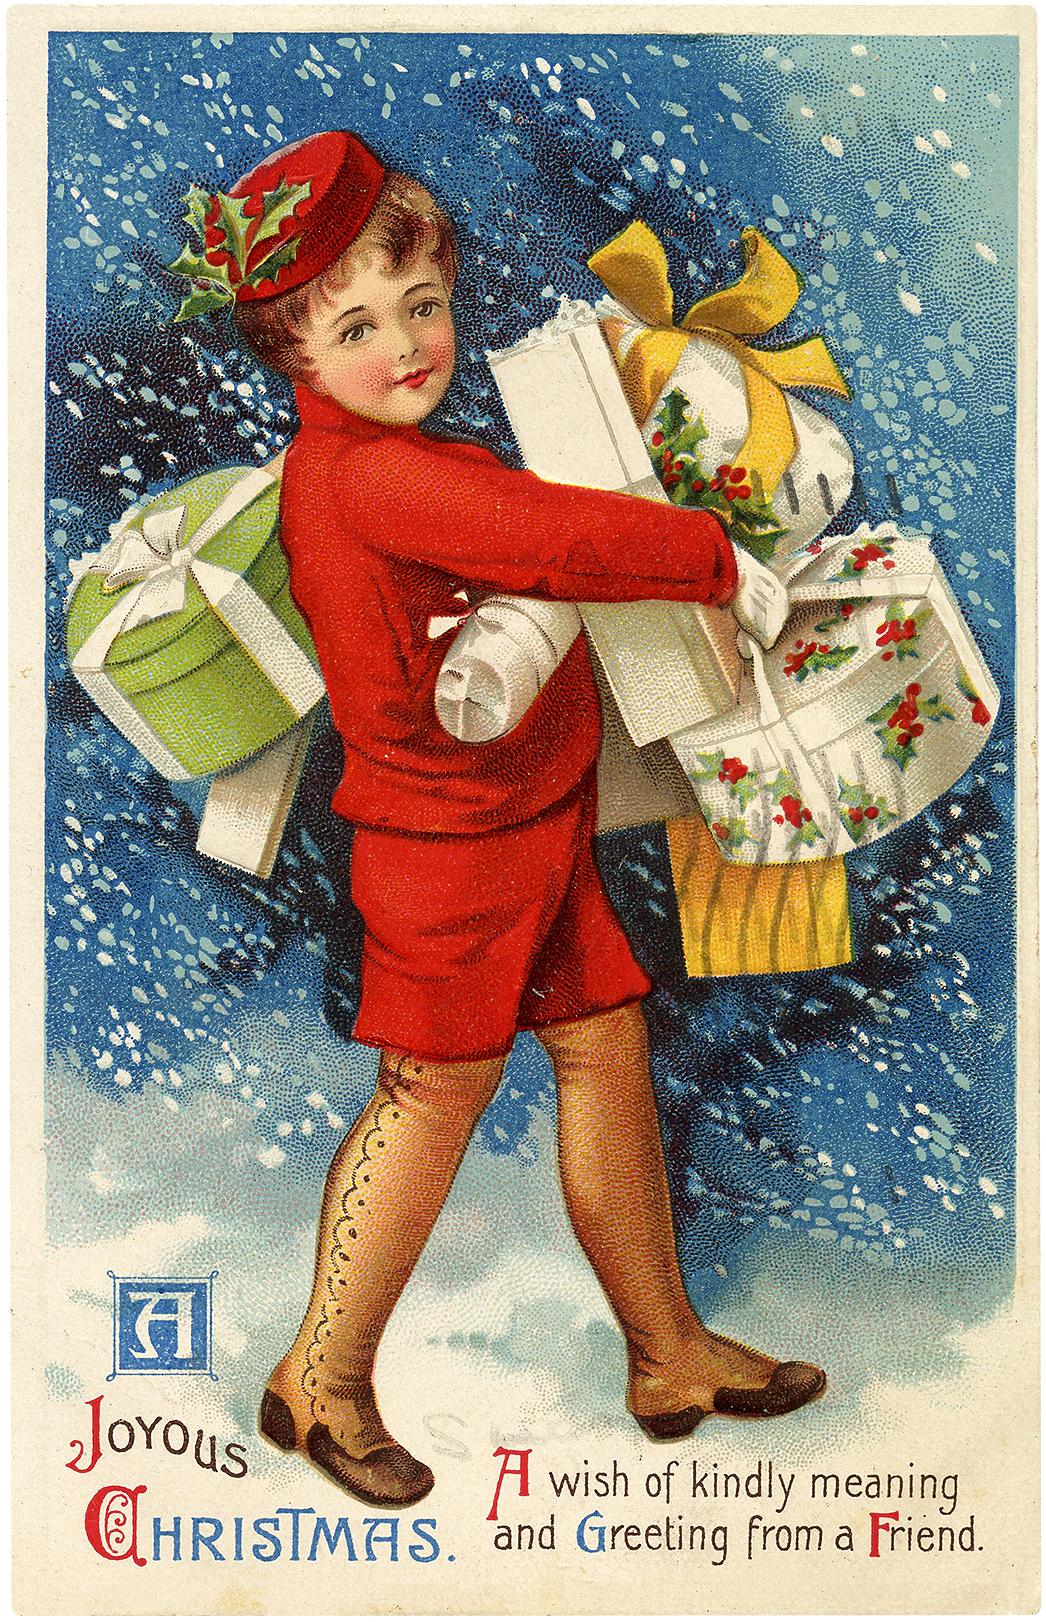 Nostalgic Christmas Delivery Boy Postcard!